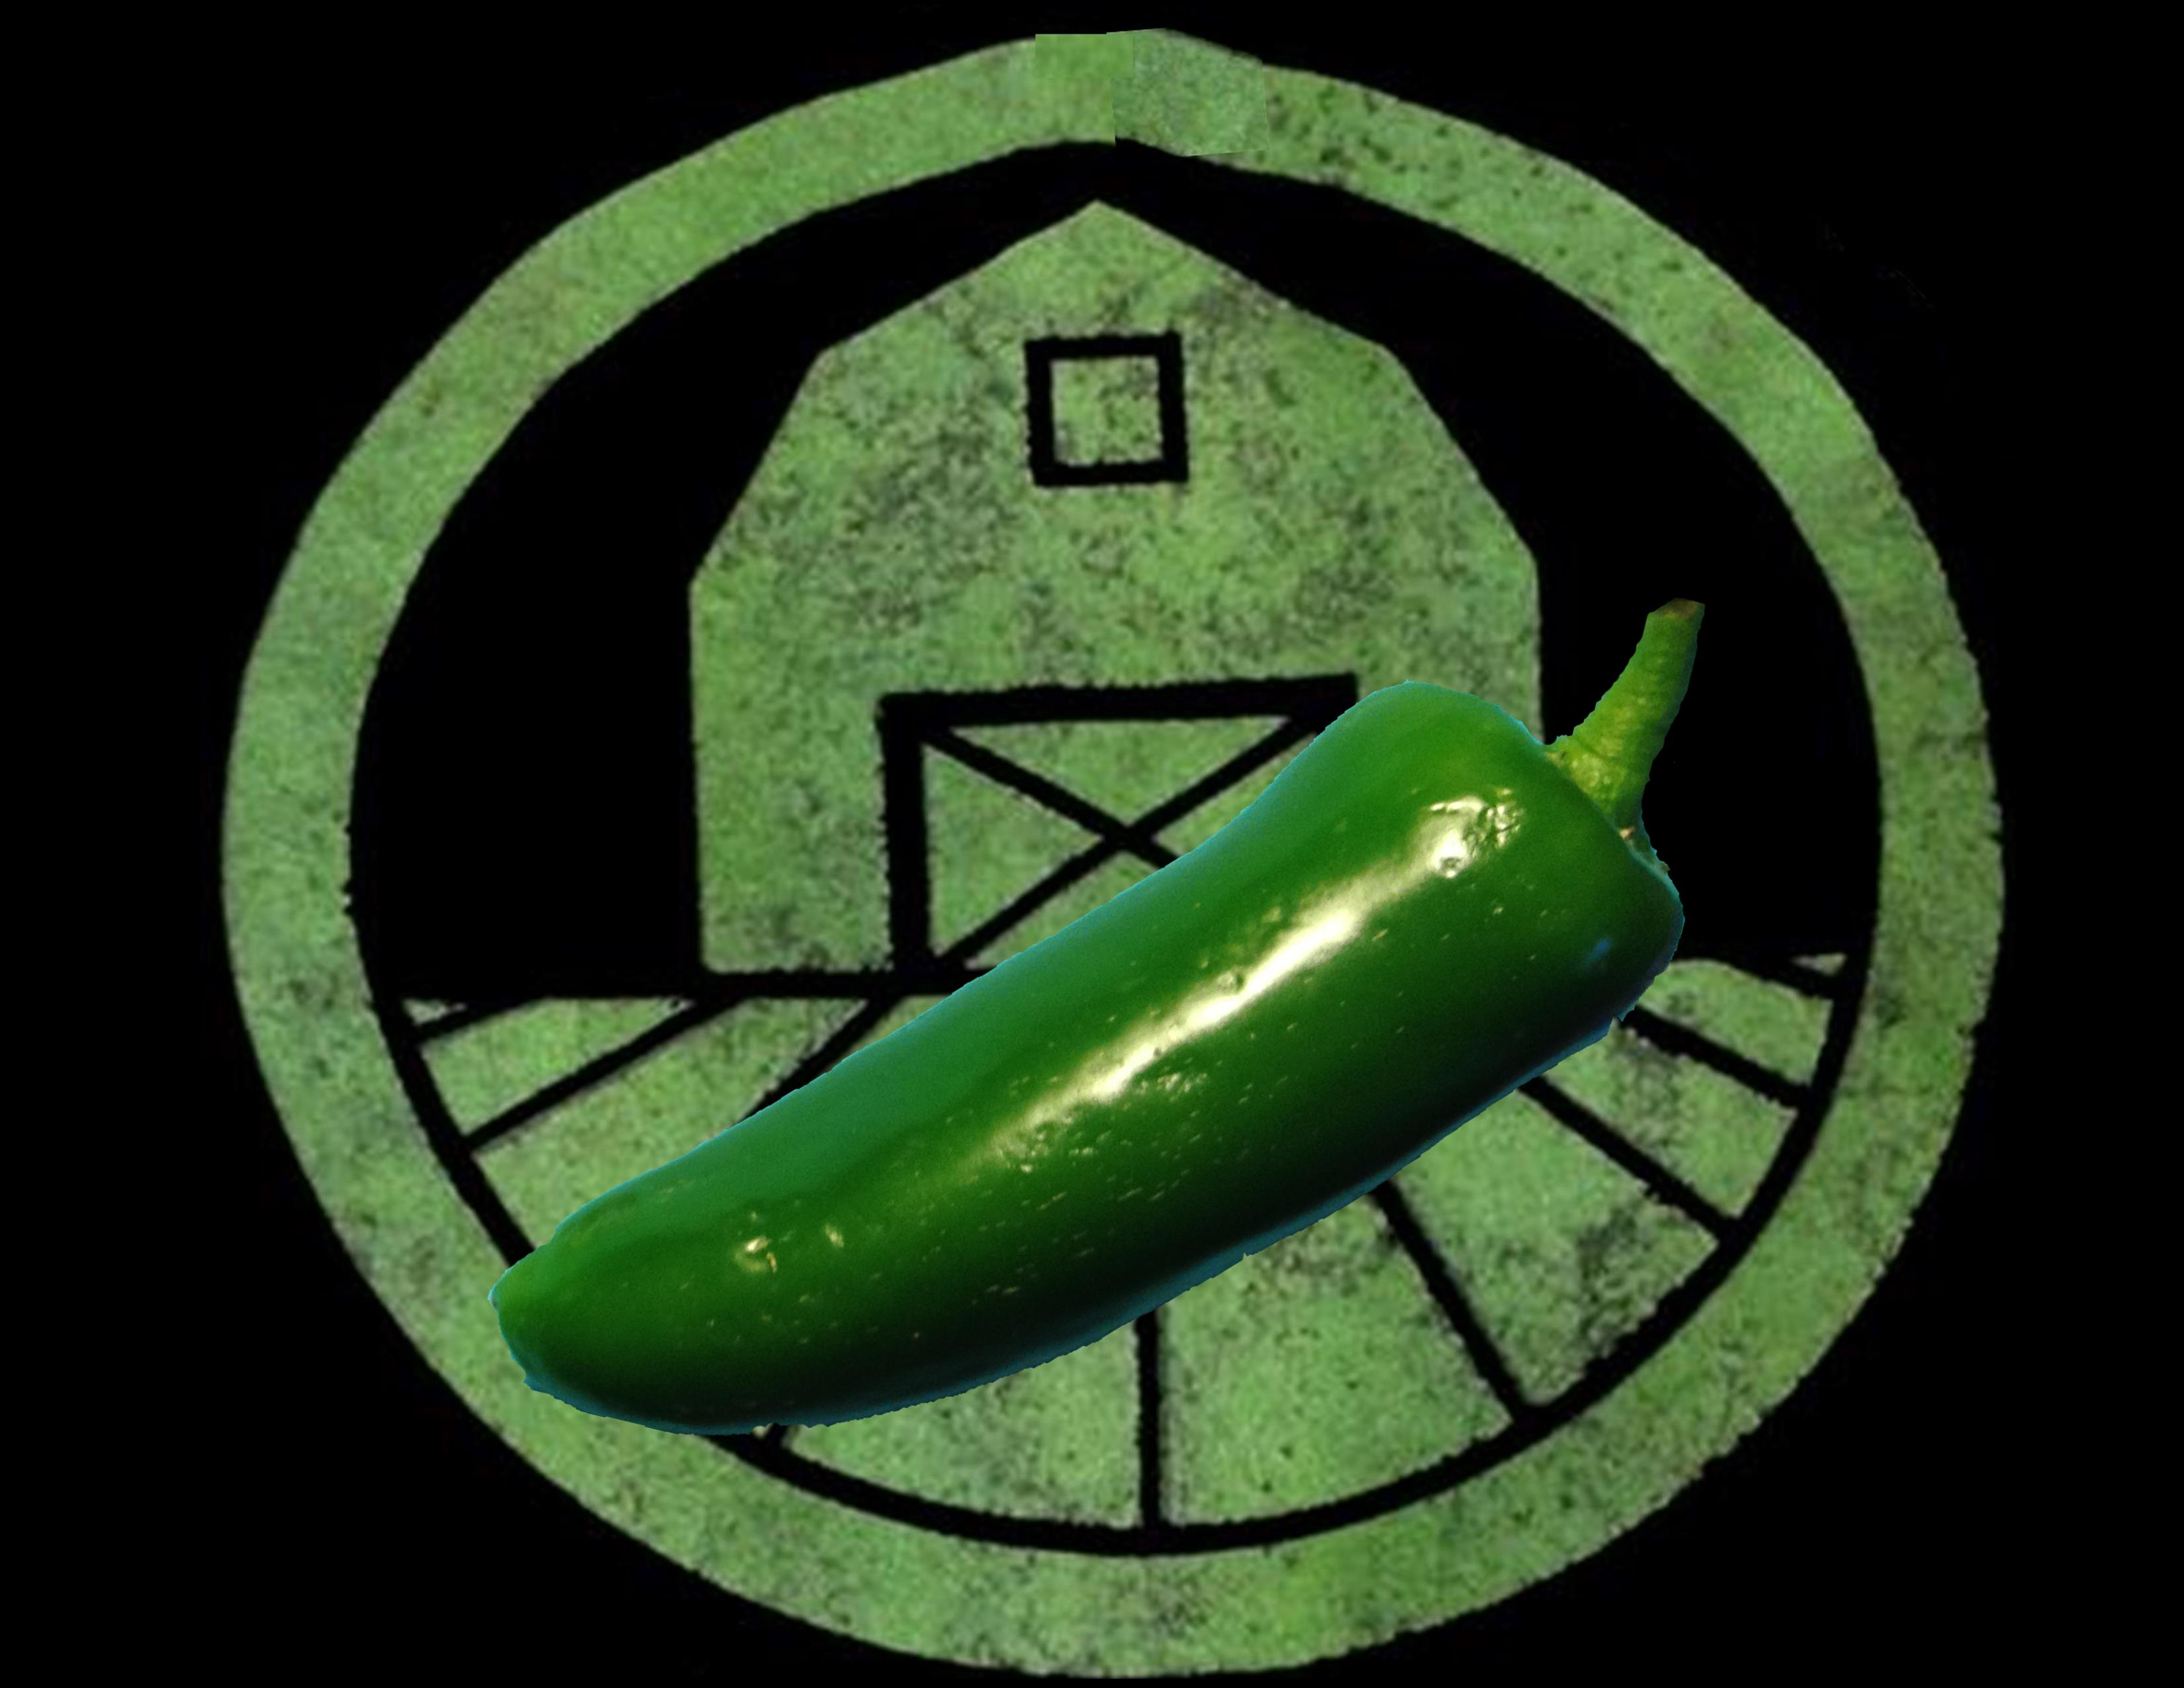 Grande Jalapeno Pepper | Tyler Farms